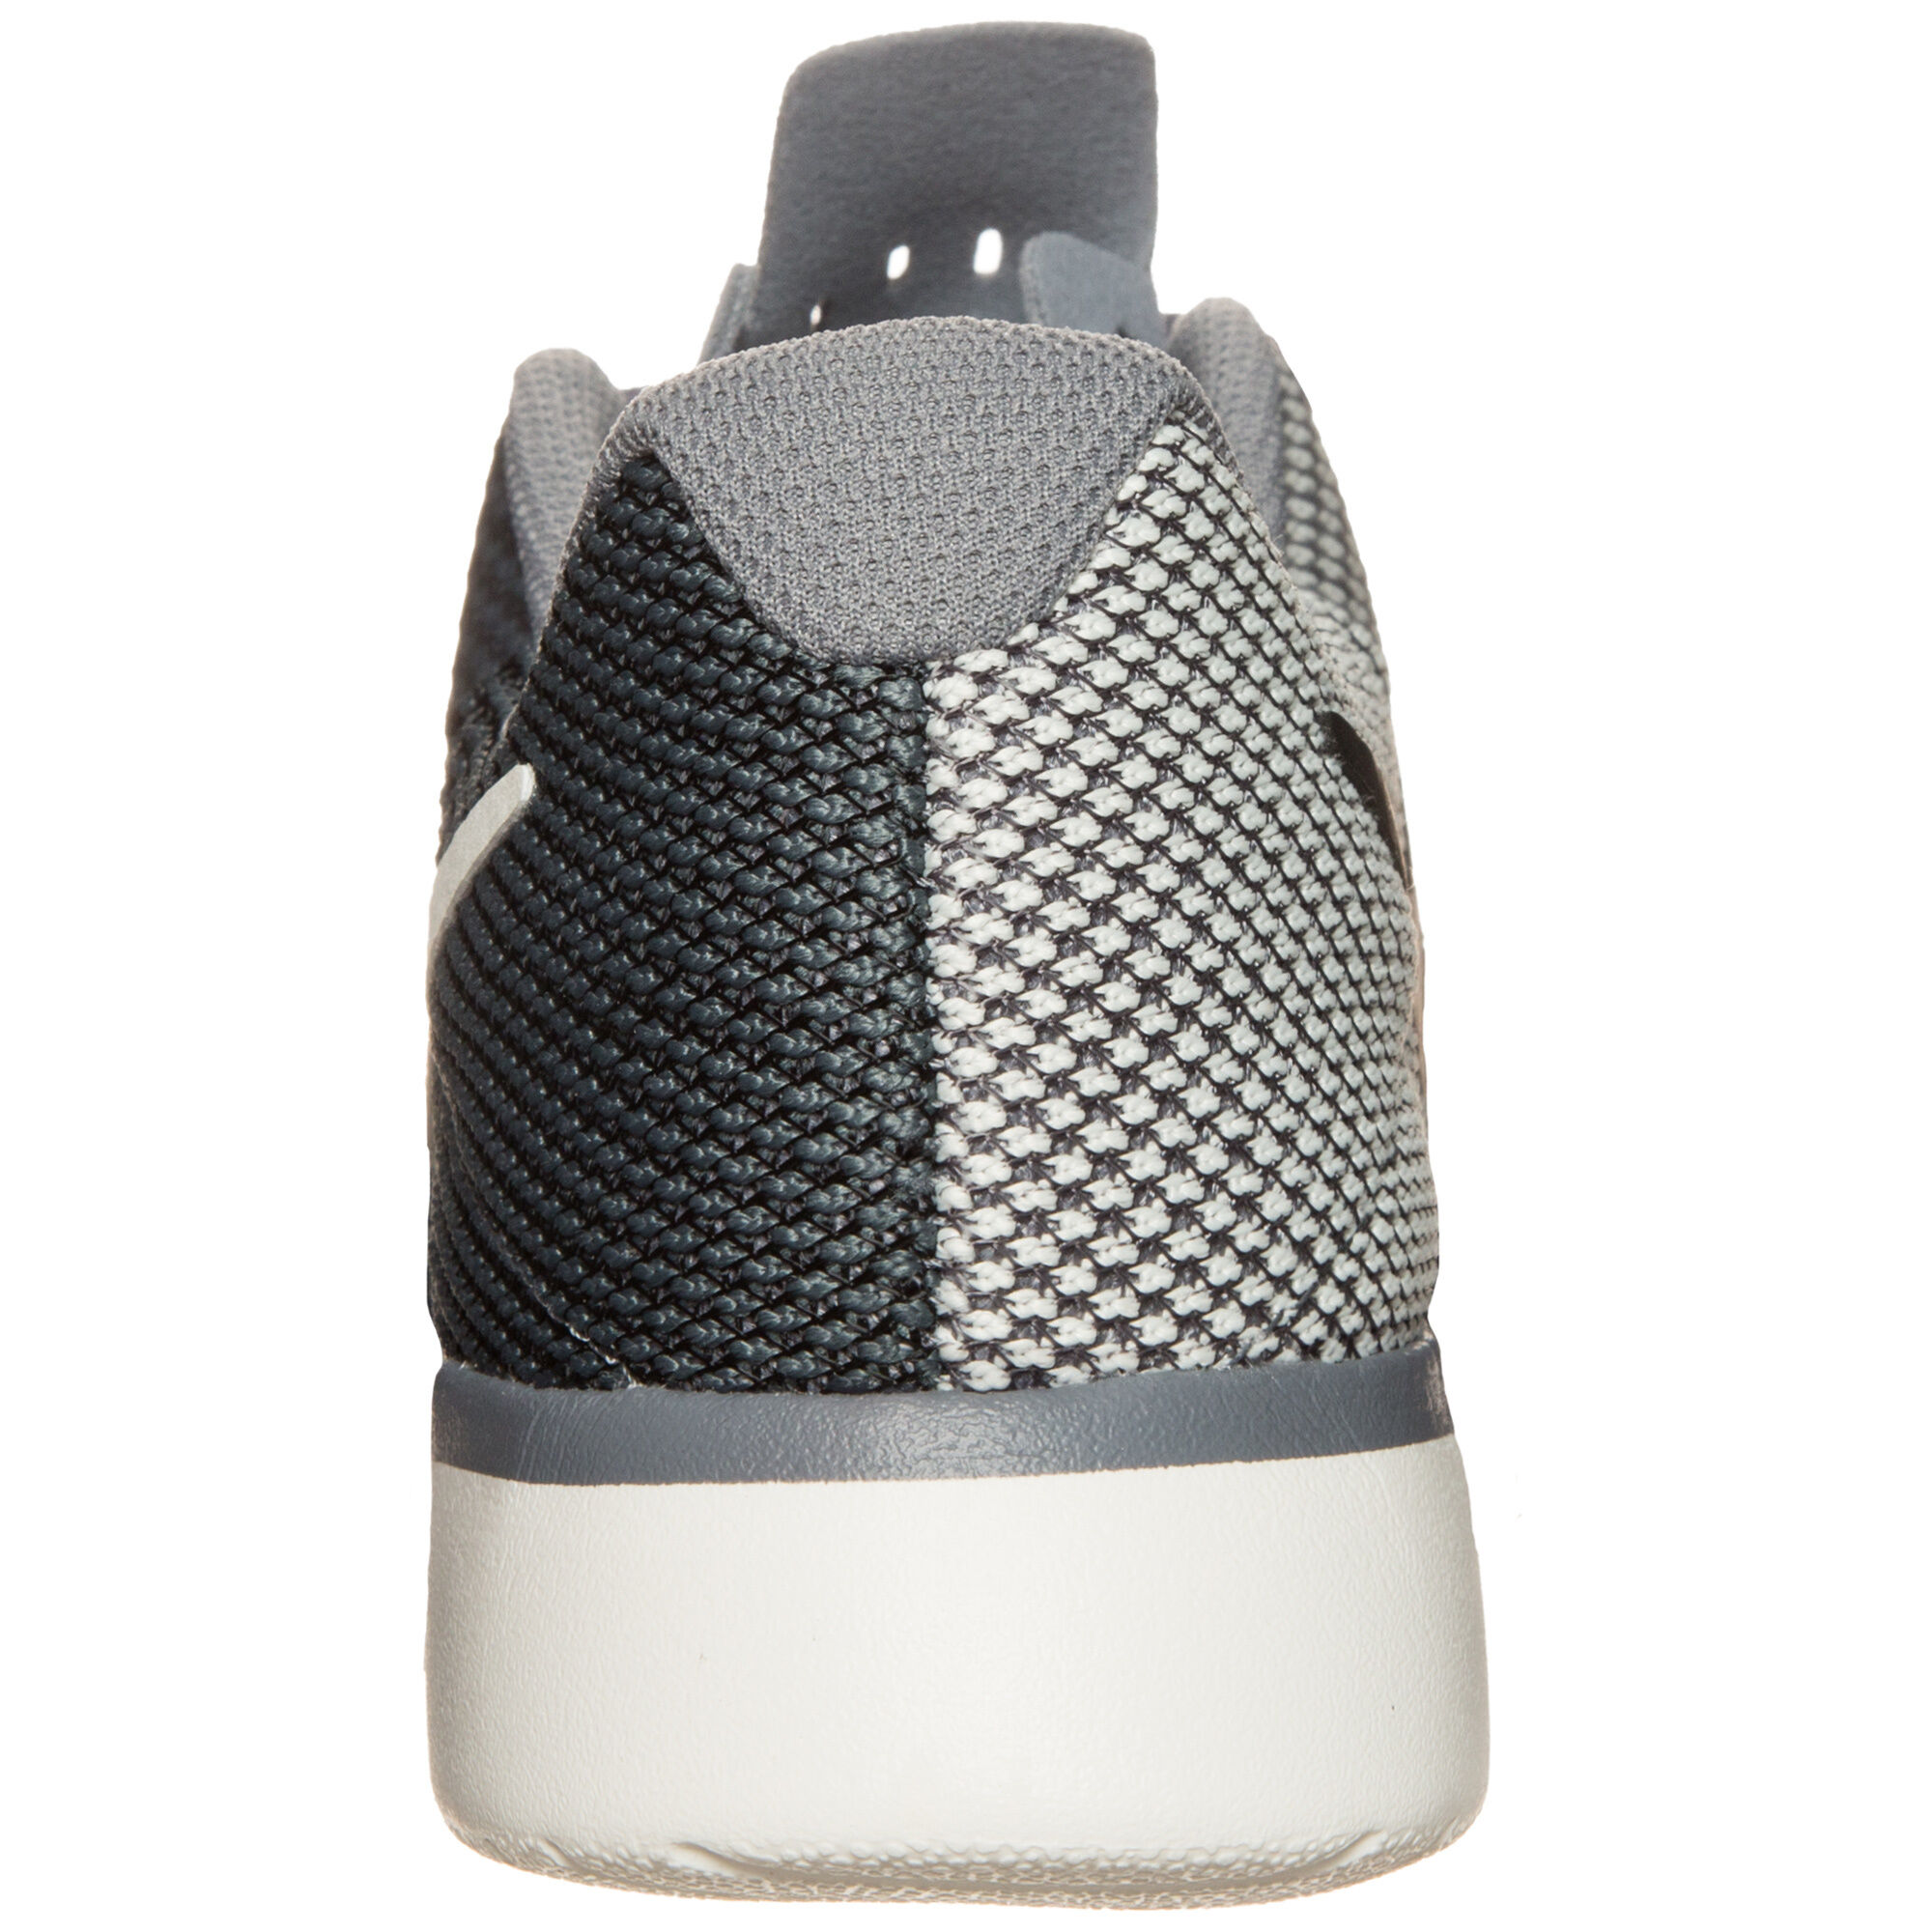 the best attitude 84e94 4e756 ... spain nike tanjun racer sneaker damen grau zoom bei outfitter online  e80d7 12184 ...